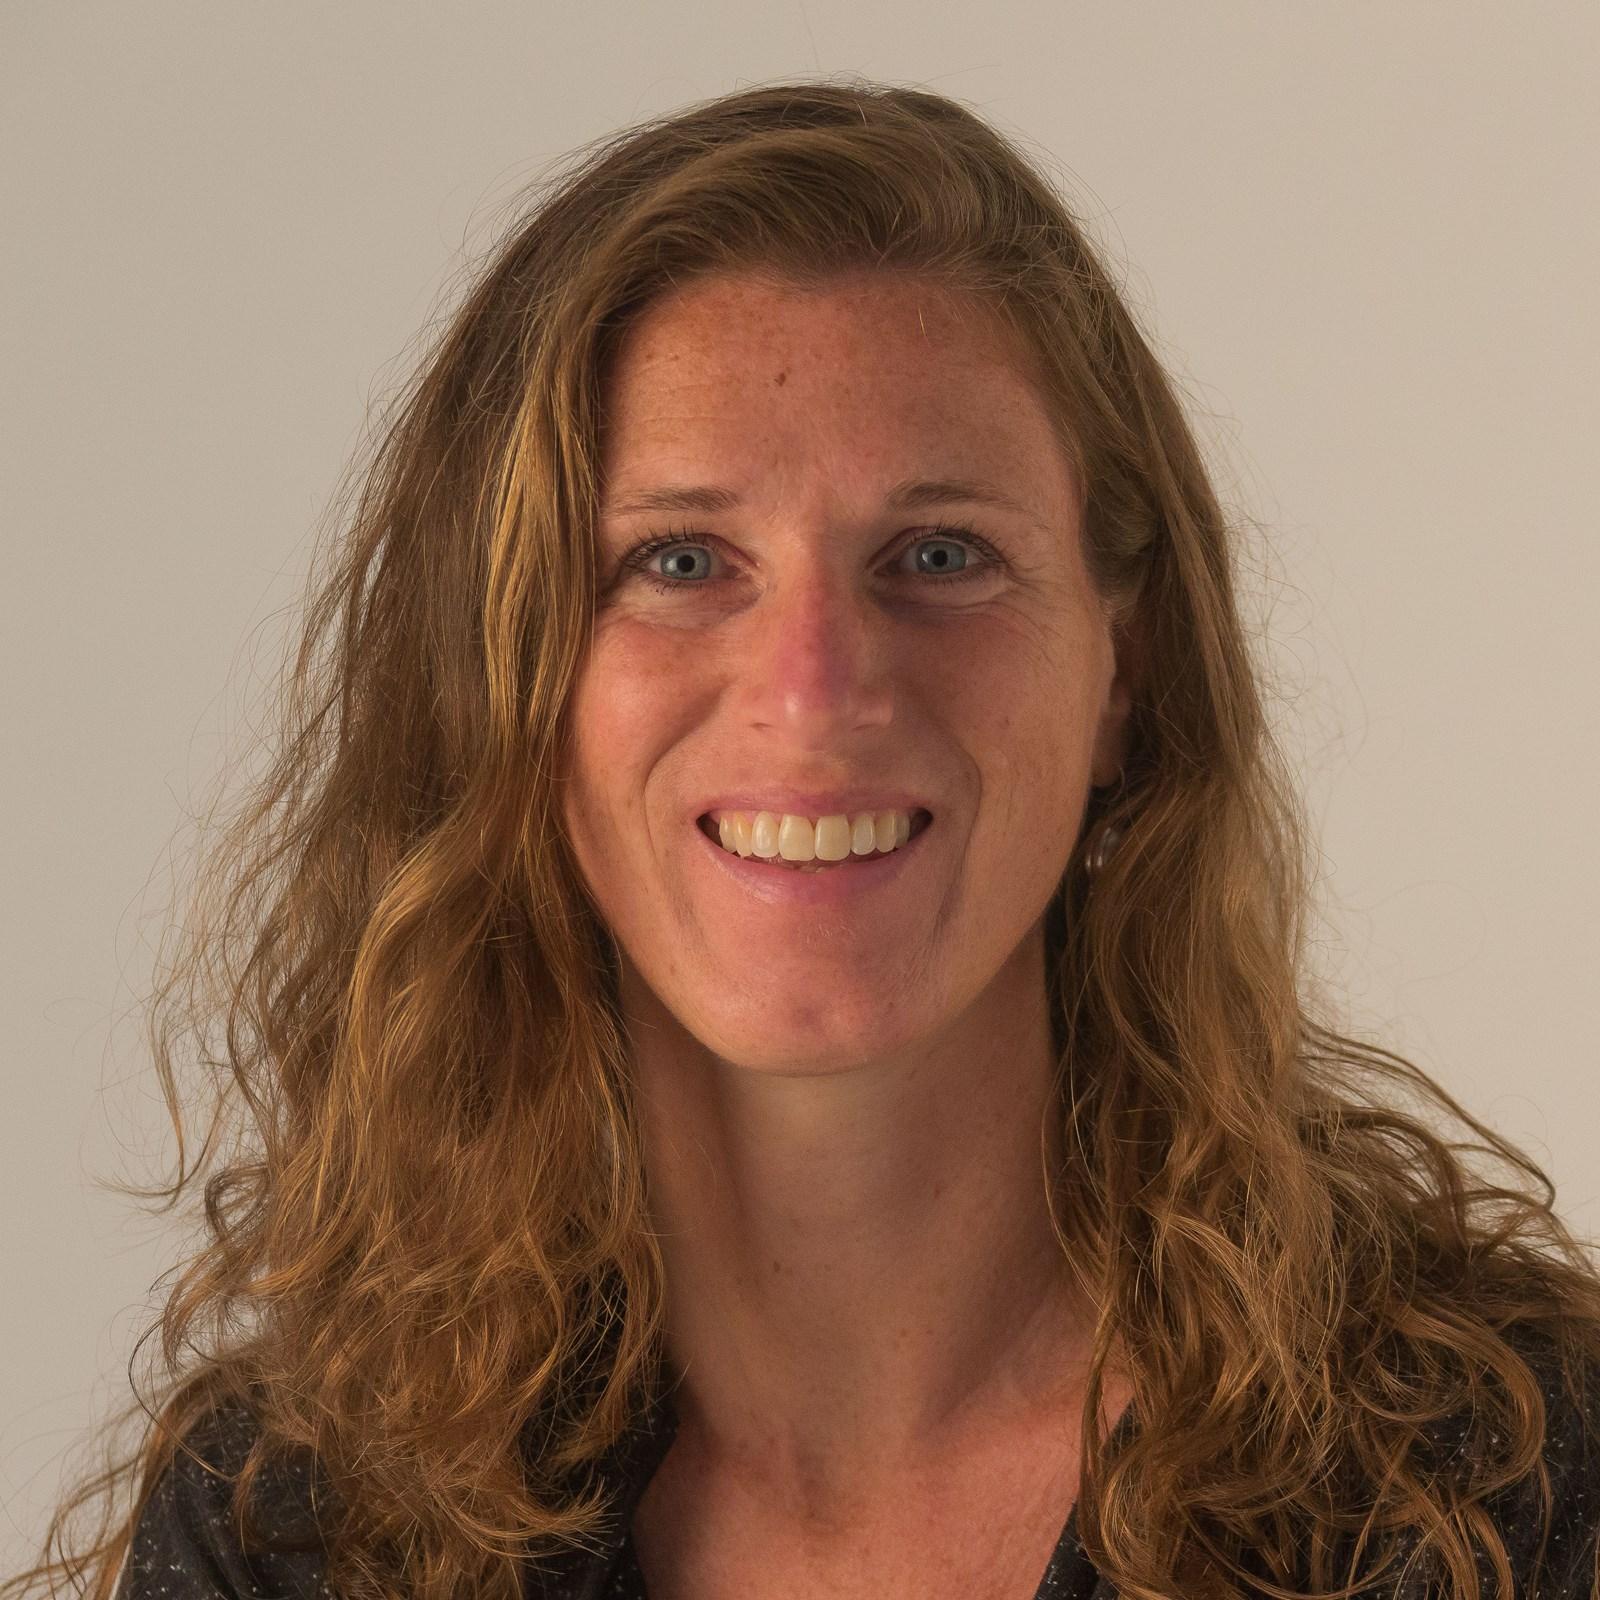 Jessica Witte